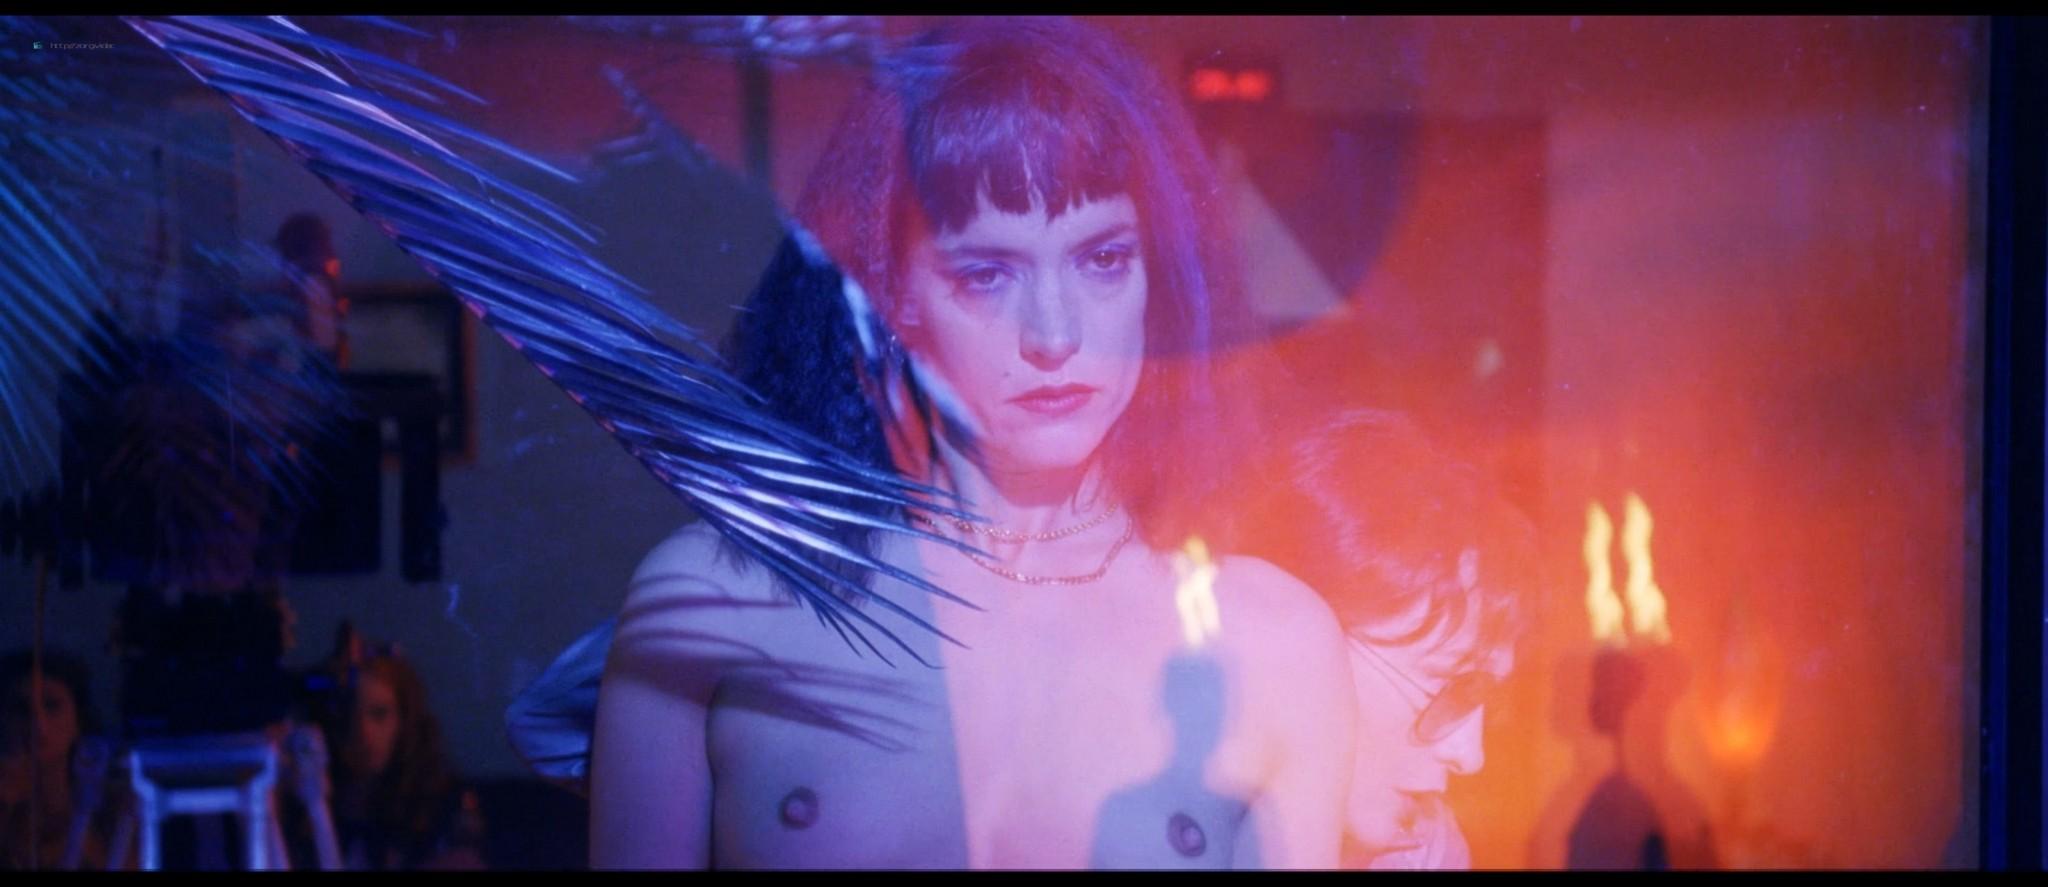 Vimala Pons nude Pauline Jacquard, Lola Créton asnd other nude too - Ultra pulpe (2018) HD 1080p Web (10)